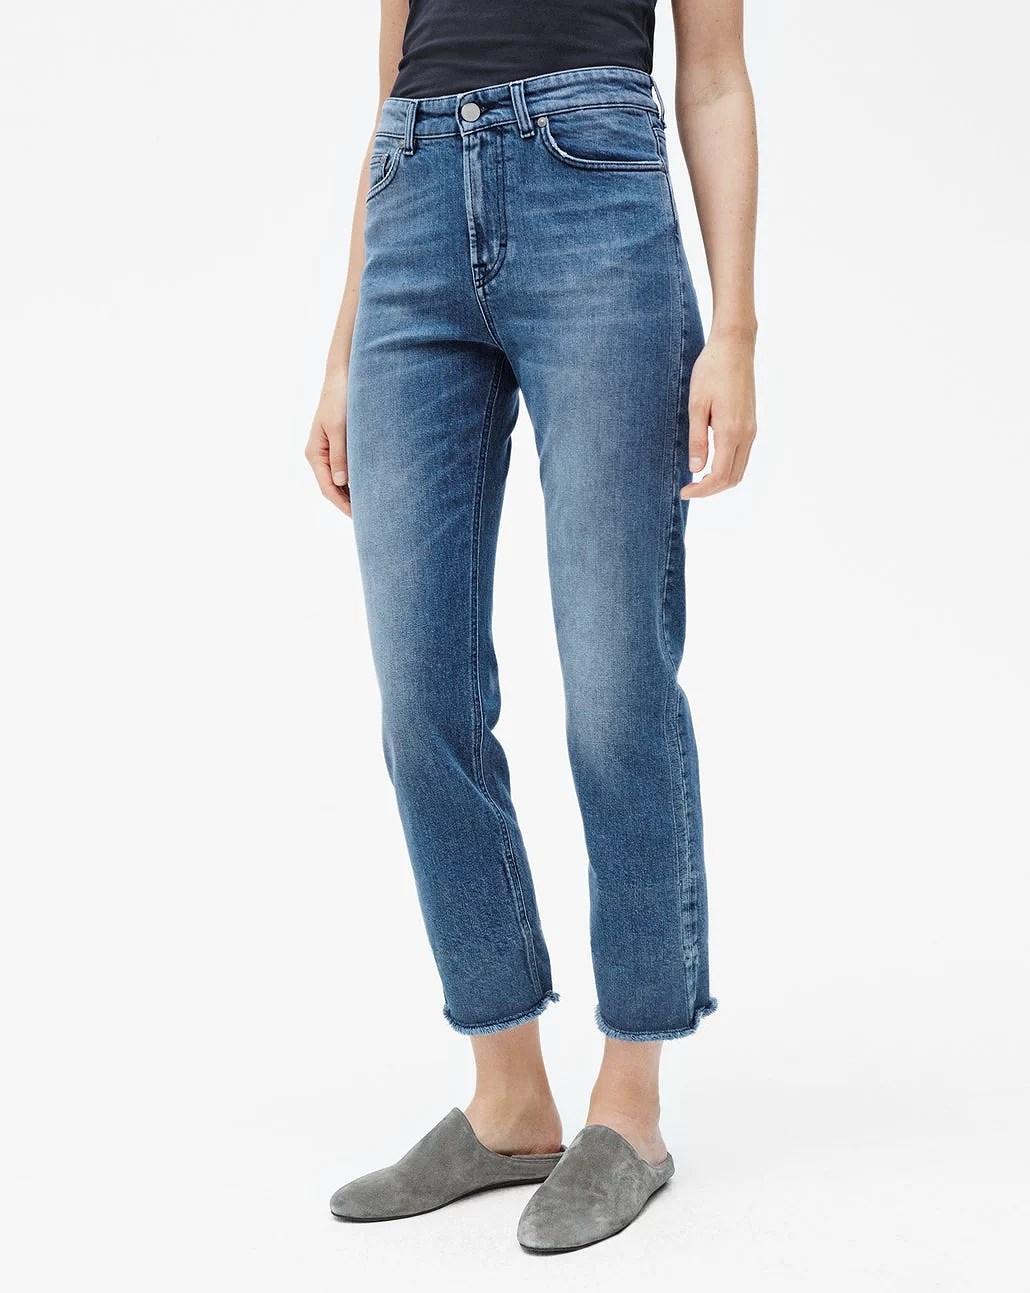 """Projekt Basgarderob"" Pt. 2 - Jeans"